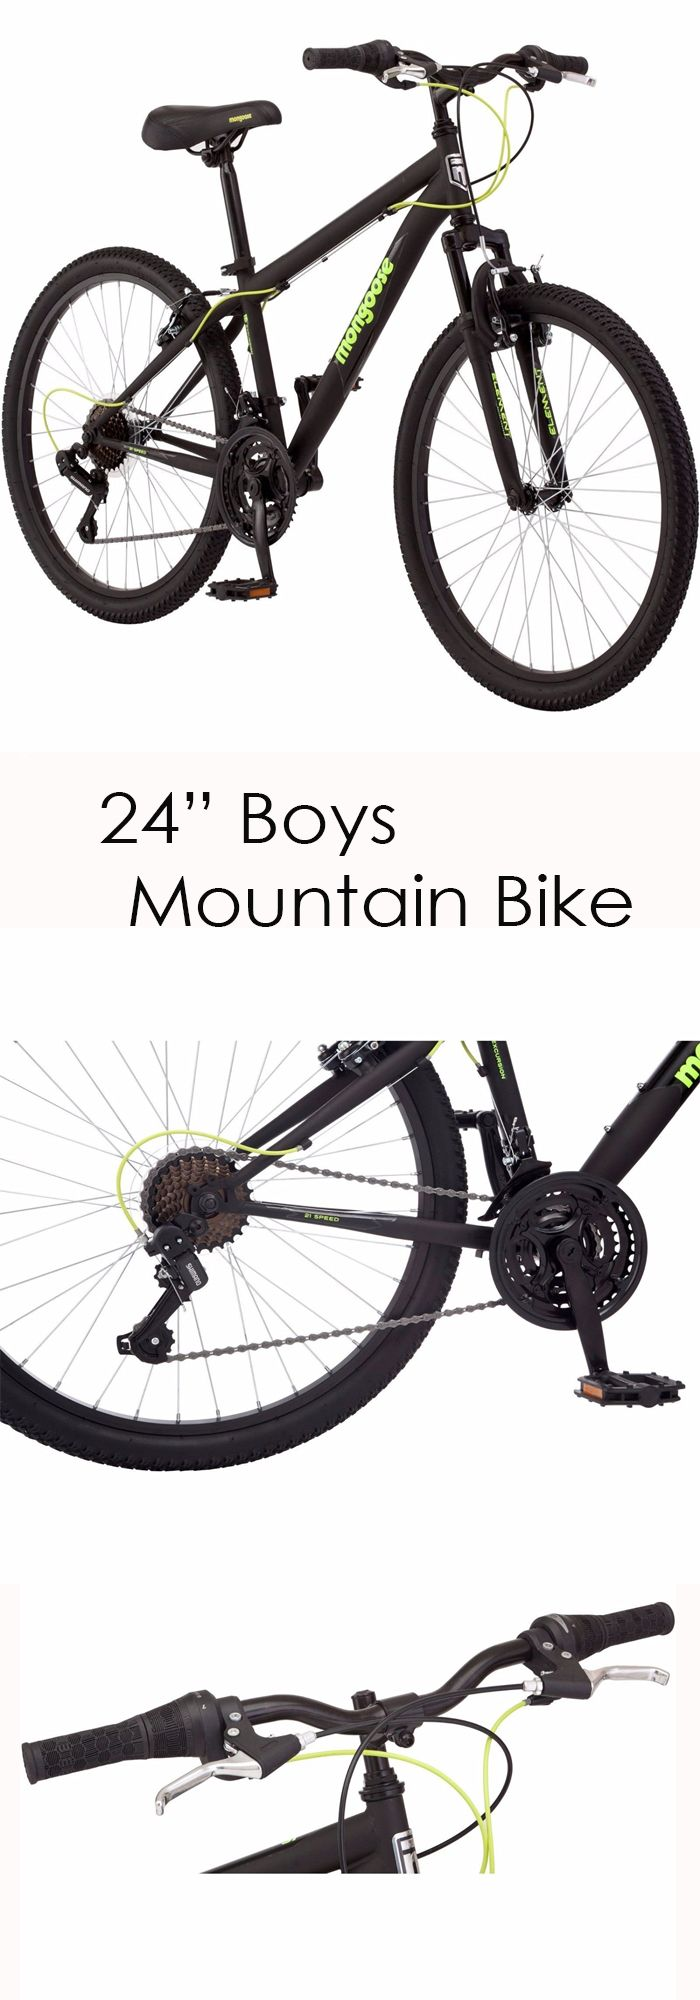 "In Stock - $177.99  24"" Boys Mountain Bike For Kids"